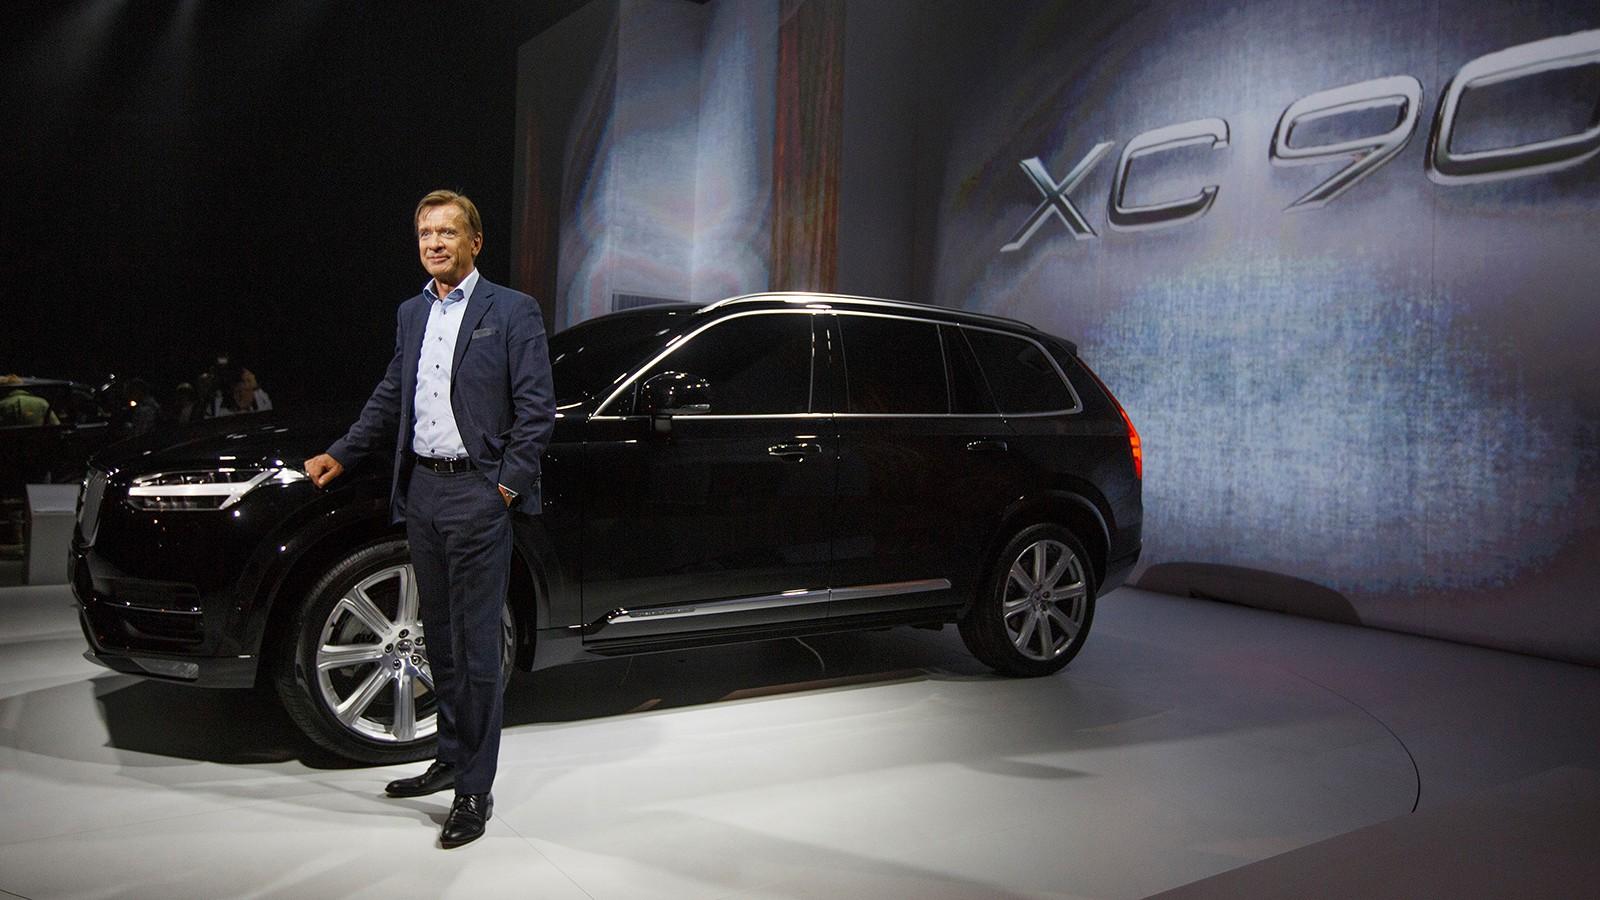 На фото: Хакан Самуэльсон и Volvo XC90